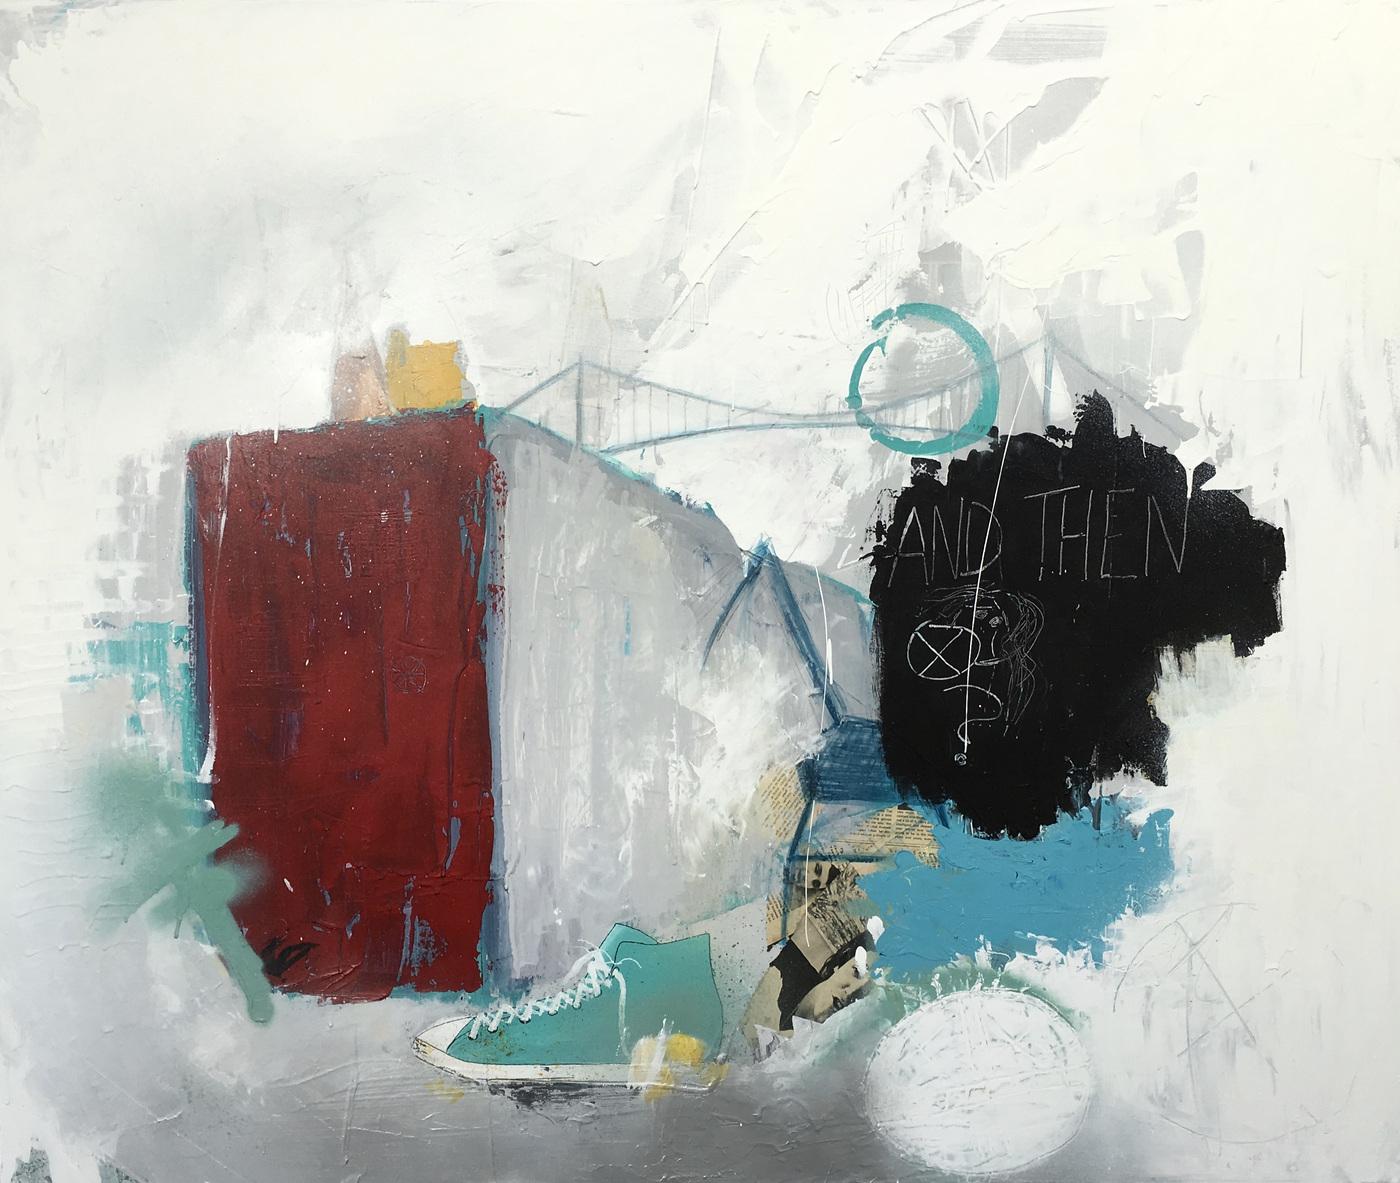 Alexander Ekman Sinclair - ART - Alla Båtar Som Passerat